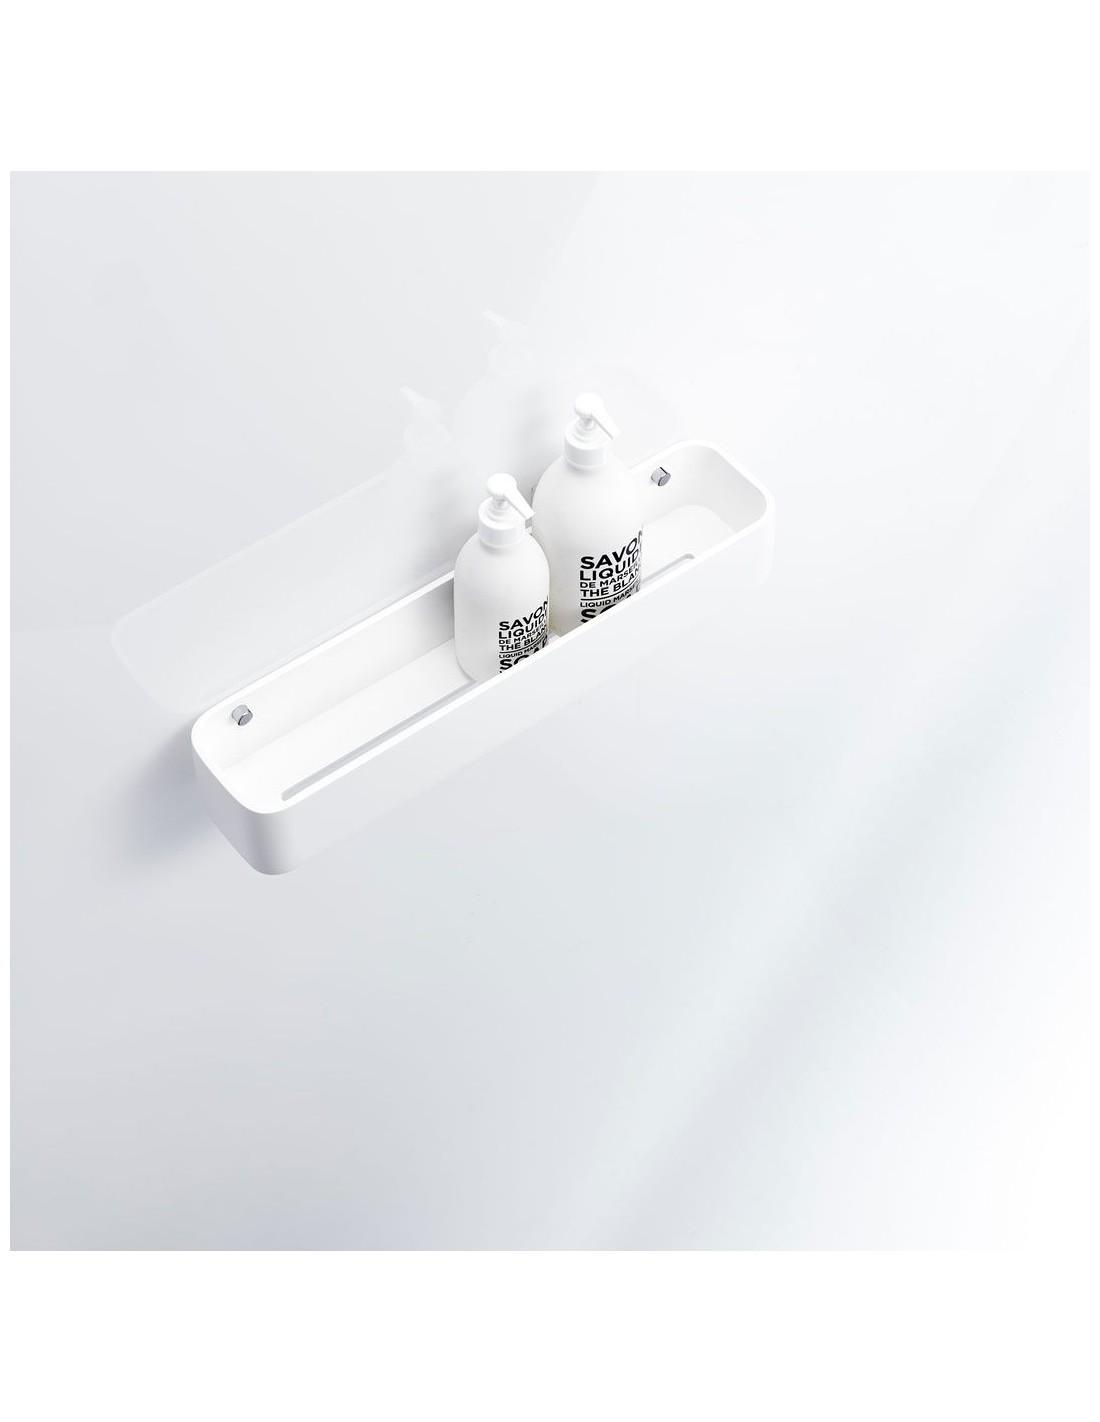 Tablette porte produits 30 cm à suspendre Stone Decor Walther Decor Walther